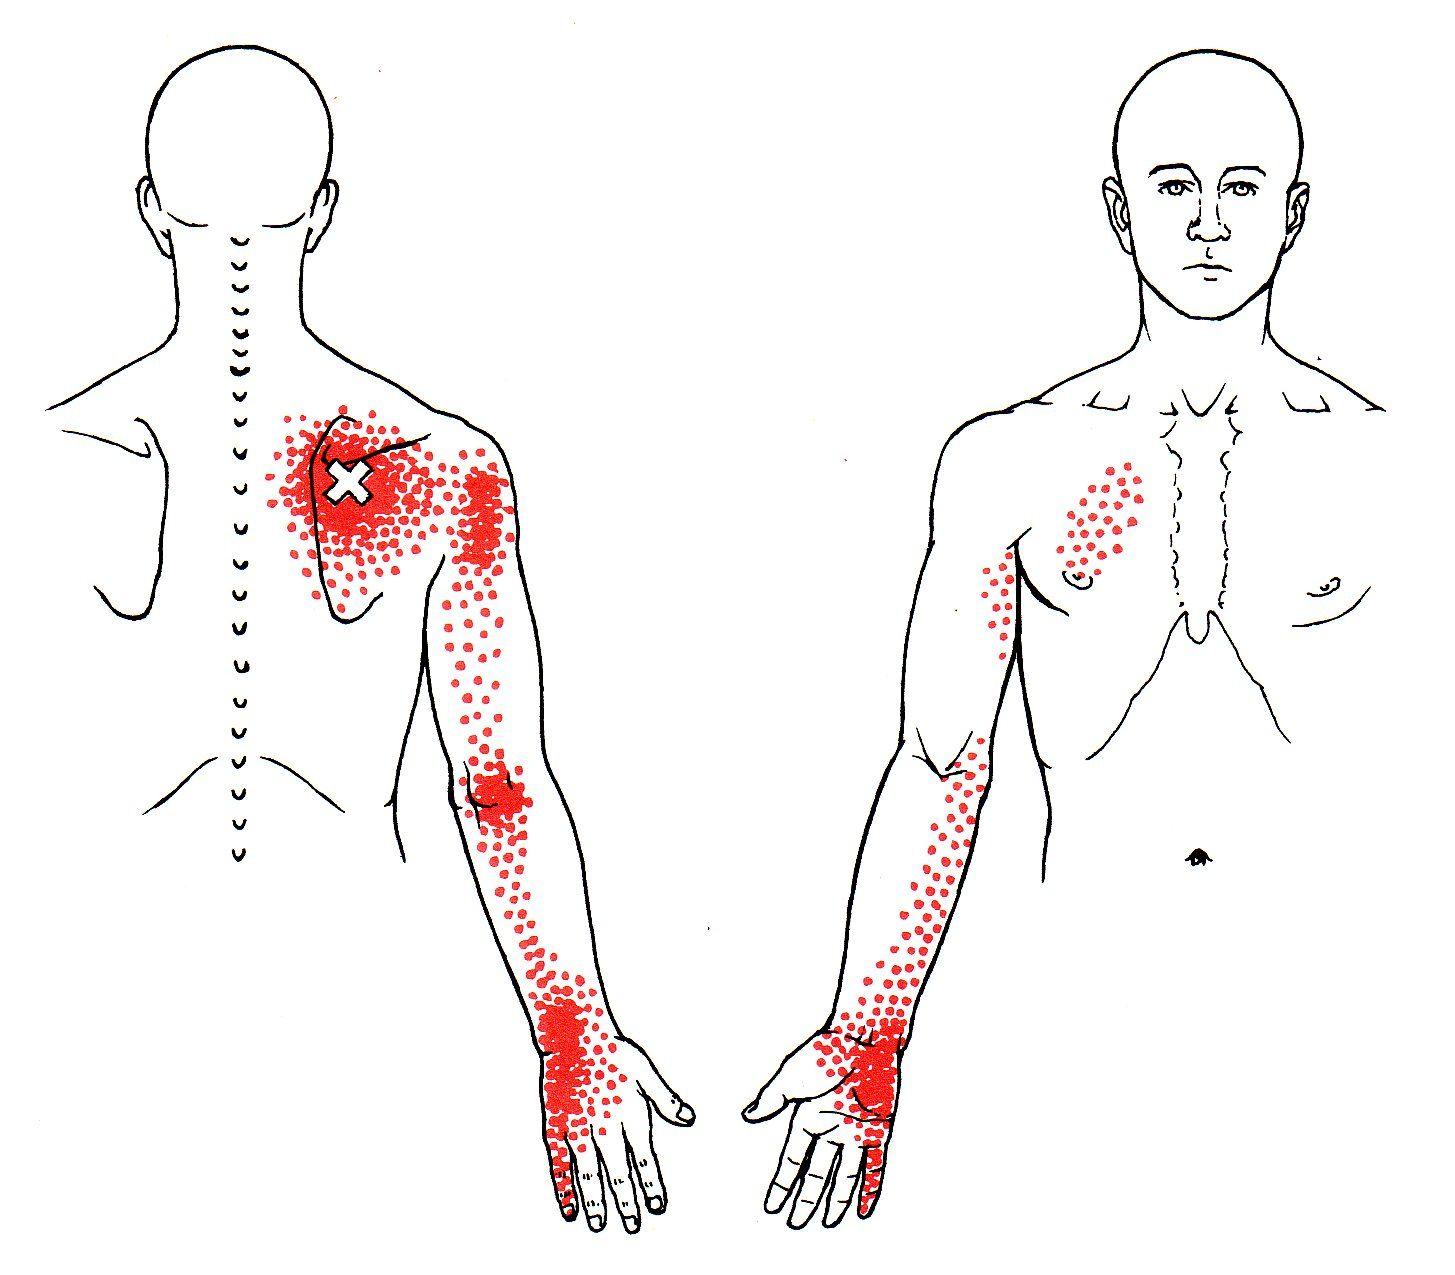 Serrato posterior superior | The Trigger Point & Referred Pain Guide ...